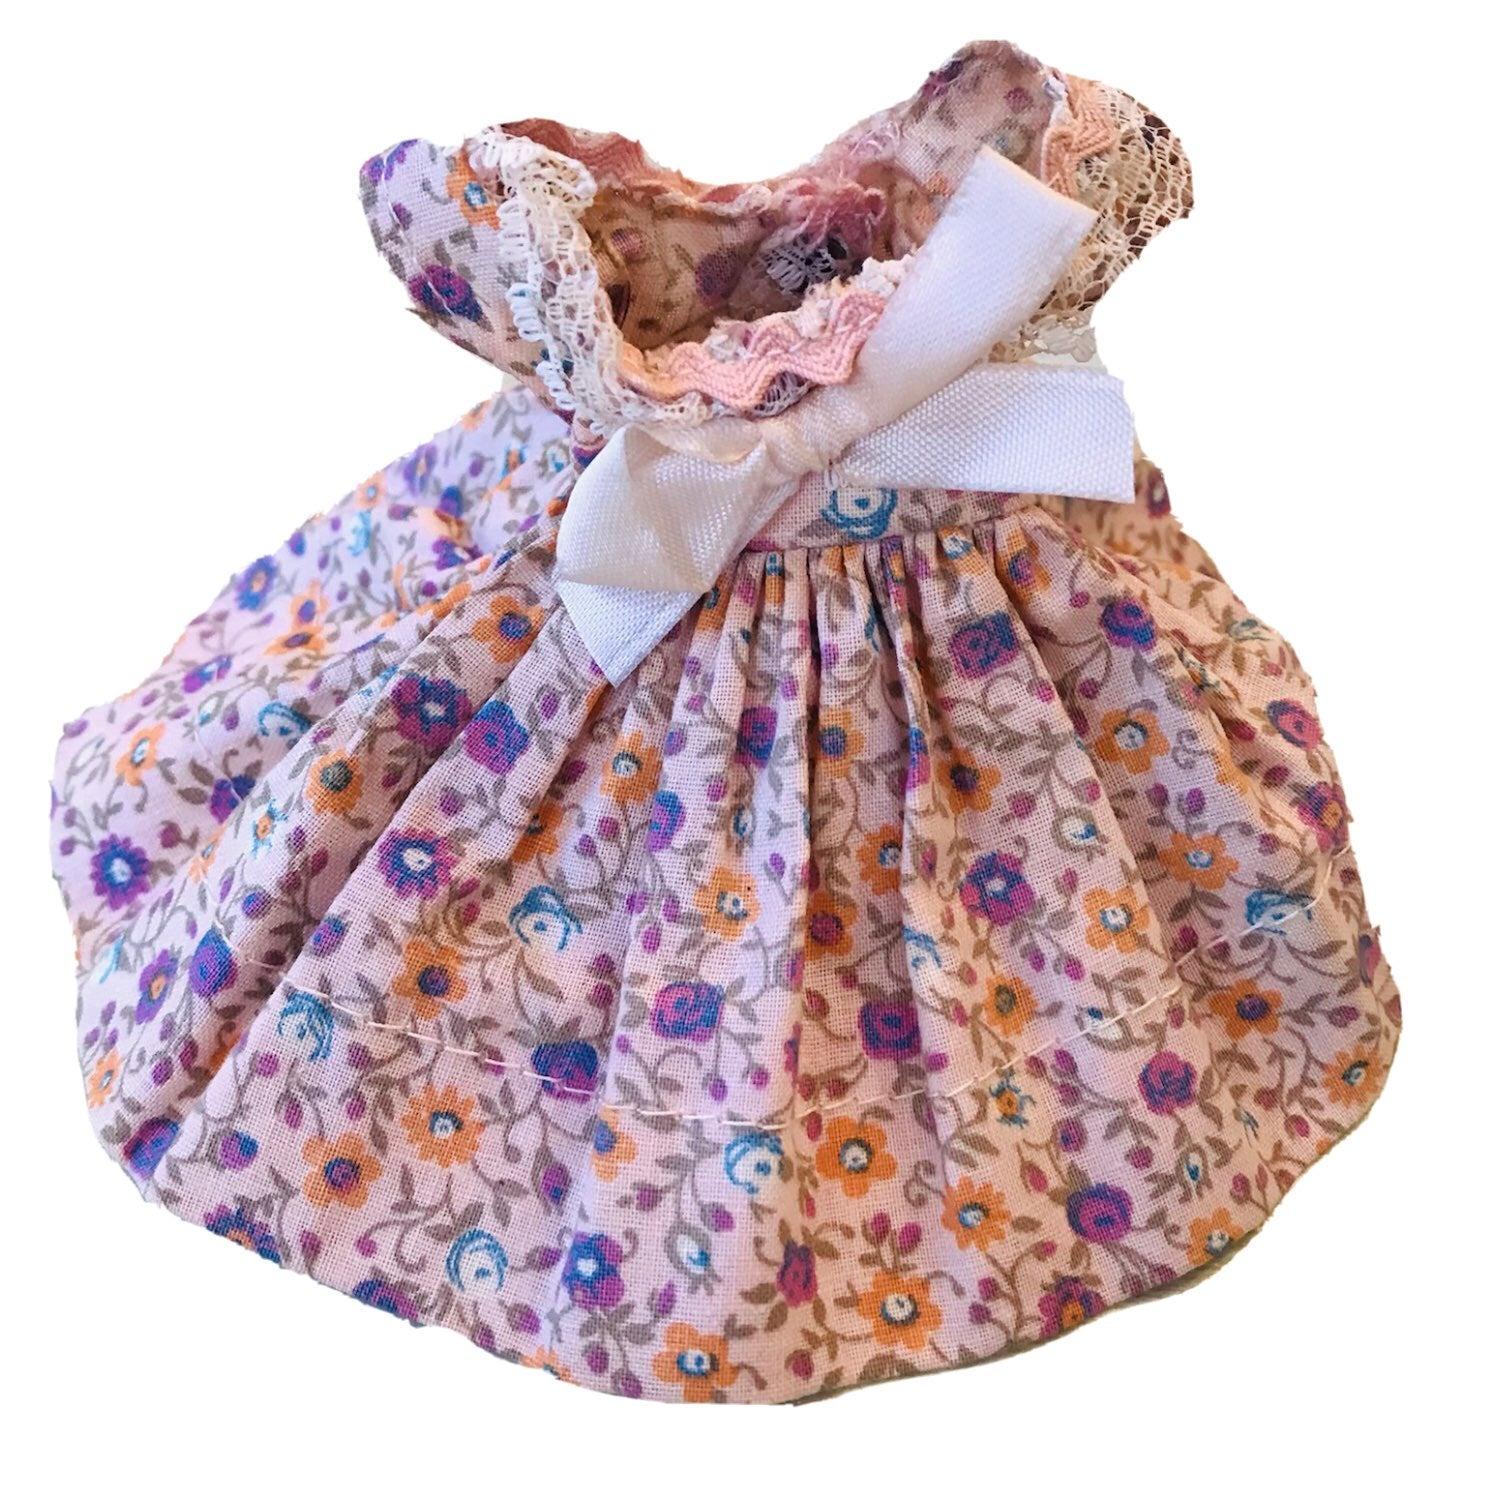 Vintage Doll Dress 8 inch Ginny 1950s